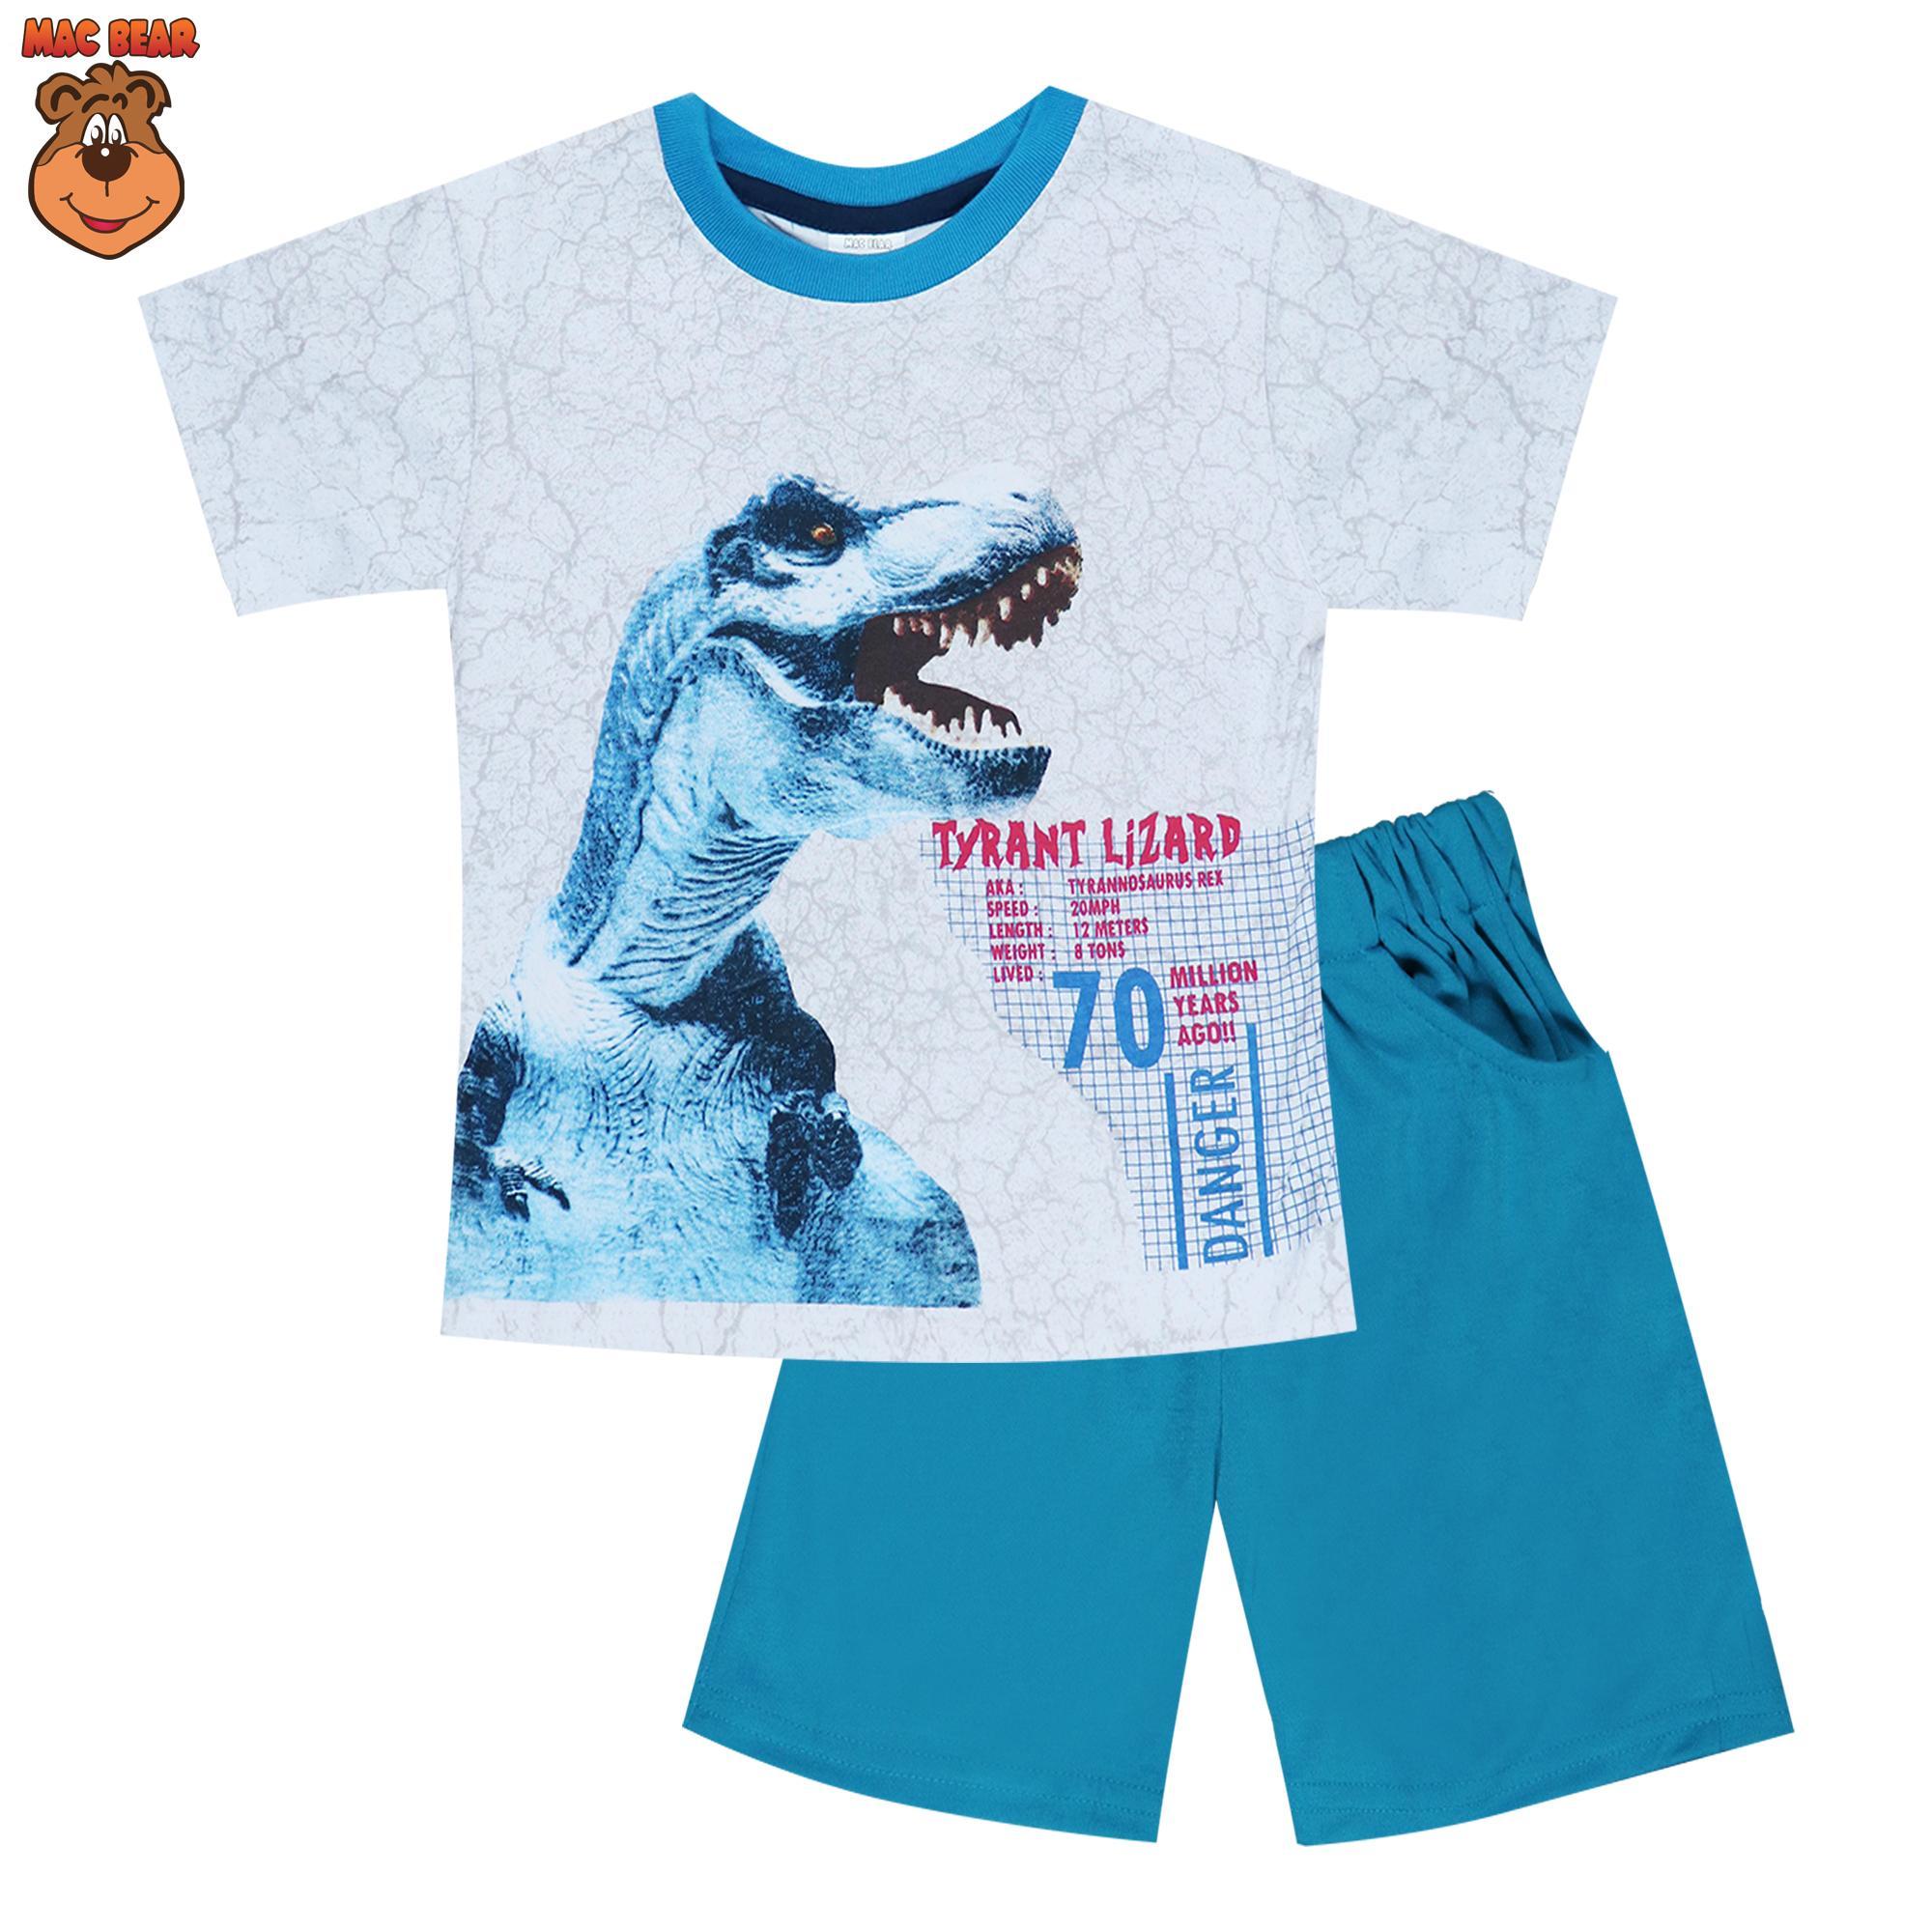 The Cheapest Price Setelan Anak Baju Bola Murah Rp22000 Macbear Kids Polo Little Dino Park Variasi Dasi Size 3 Biru T Rex